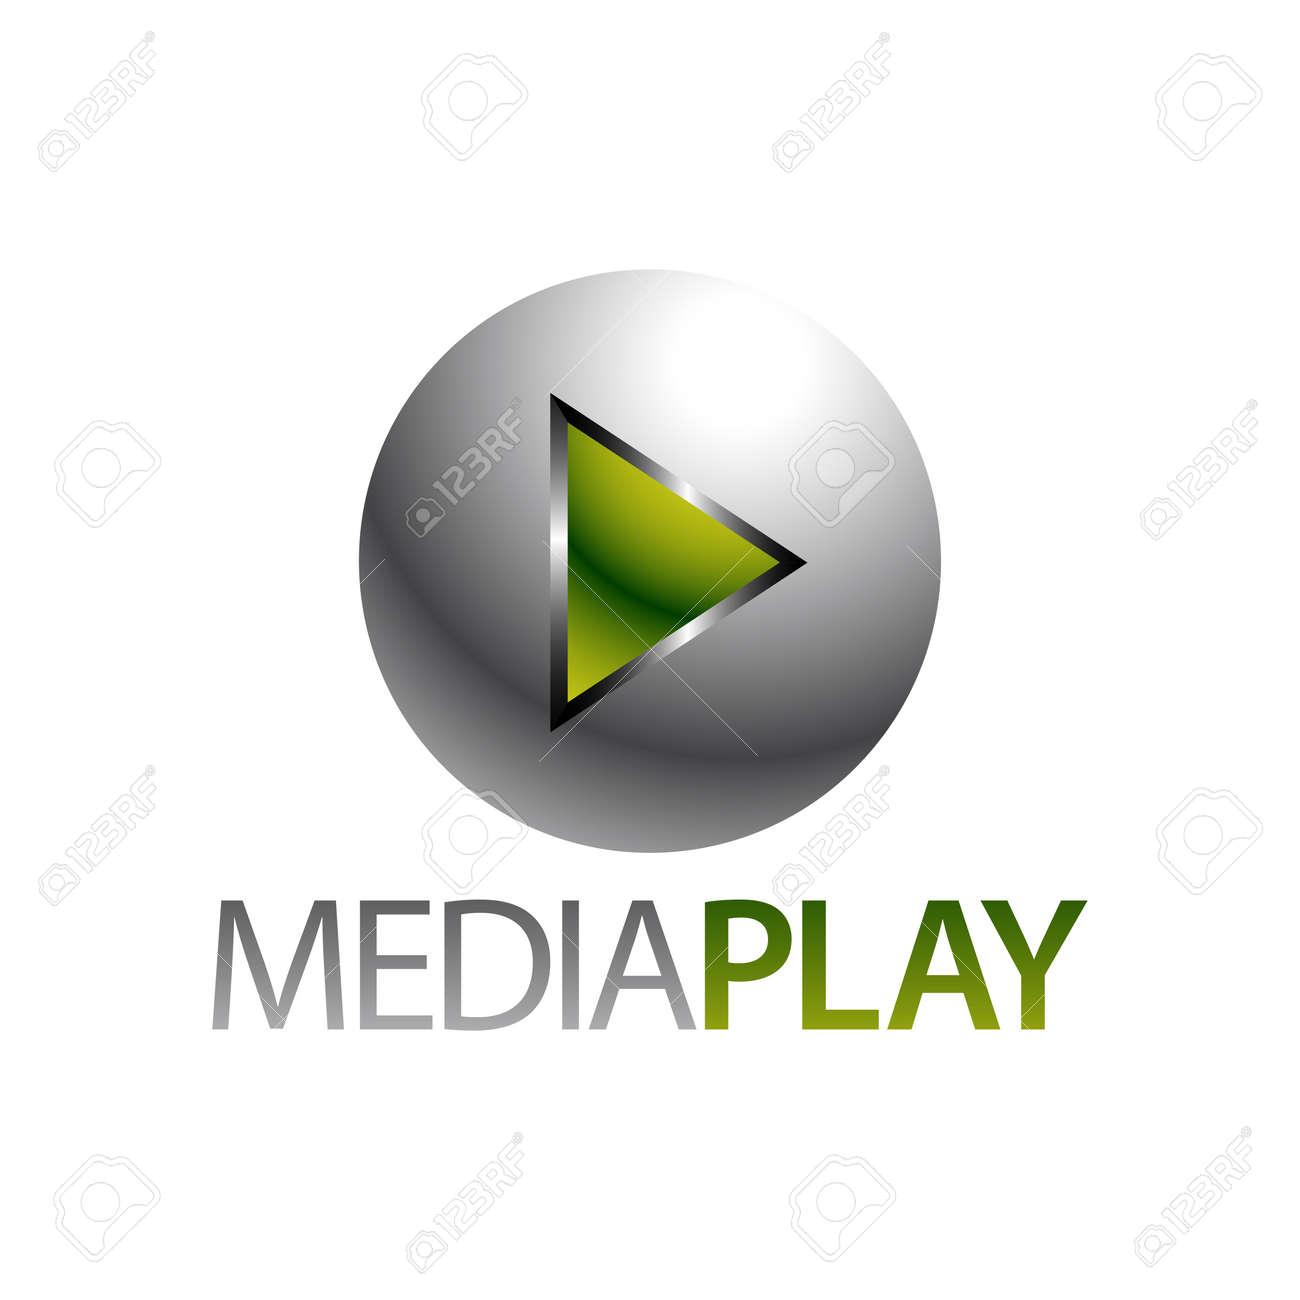 Shiny sphere green media play icon logo concept design template idea - 143647446